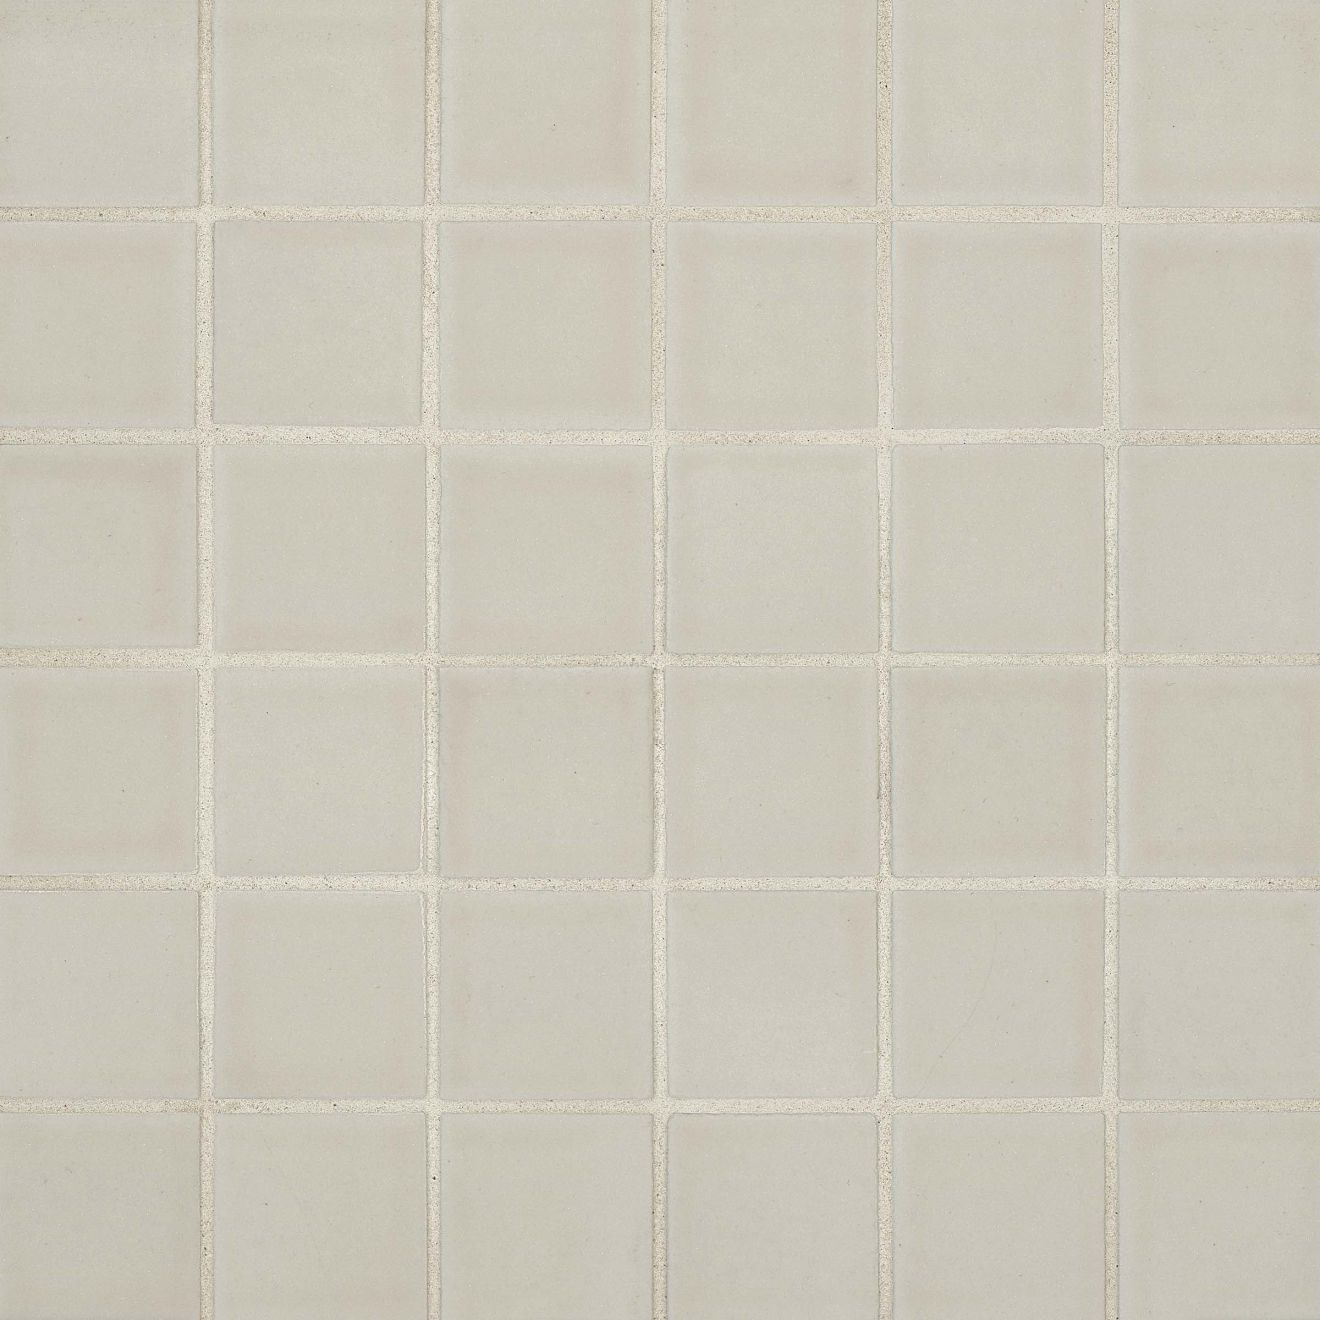 "True 2"" x 2"" Floor & Wall Mosaic in Canvas"